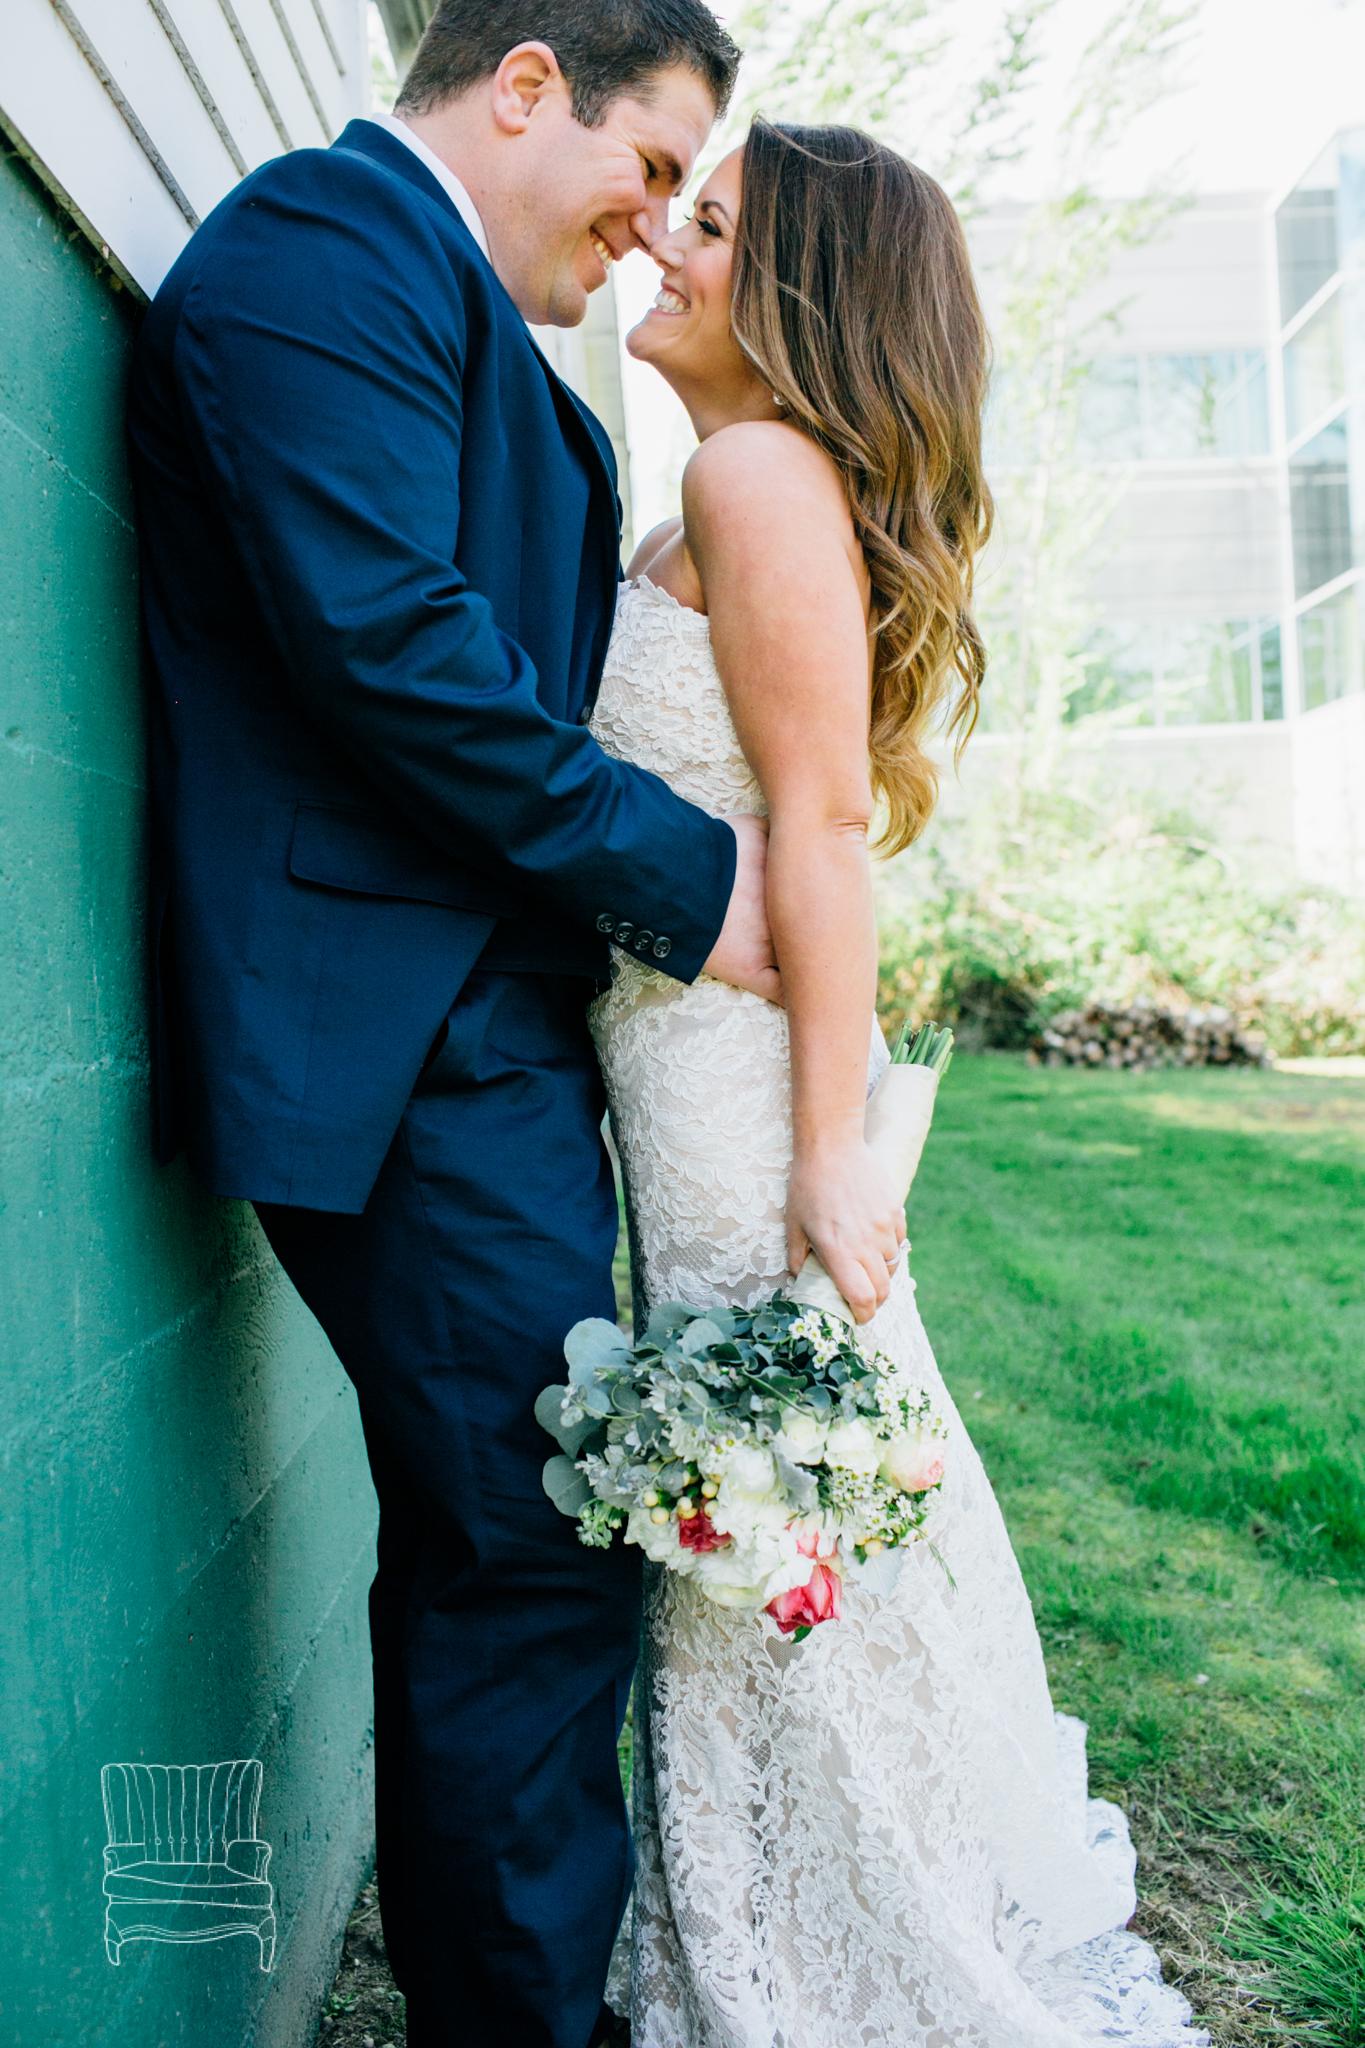 seattle-wedding-photographer-katheryn-moran-russells-bothell-wilkins-wedding-photo-31.jpg